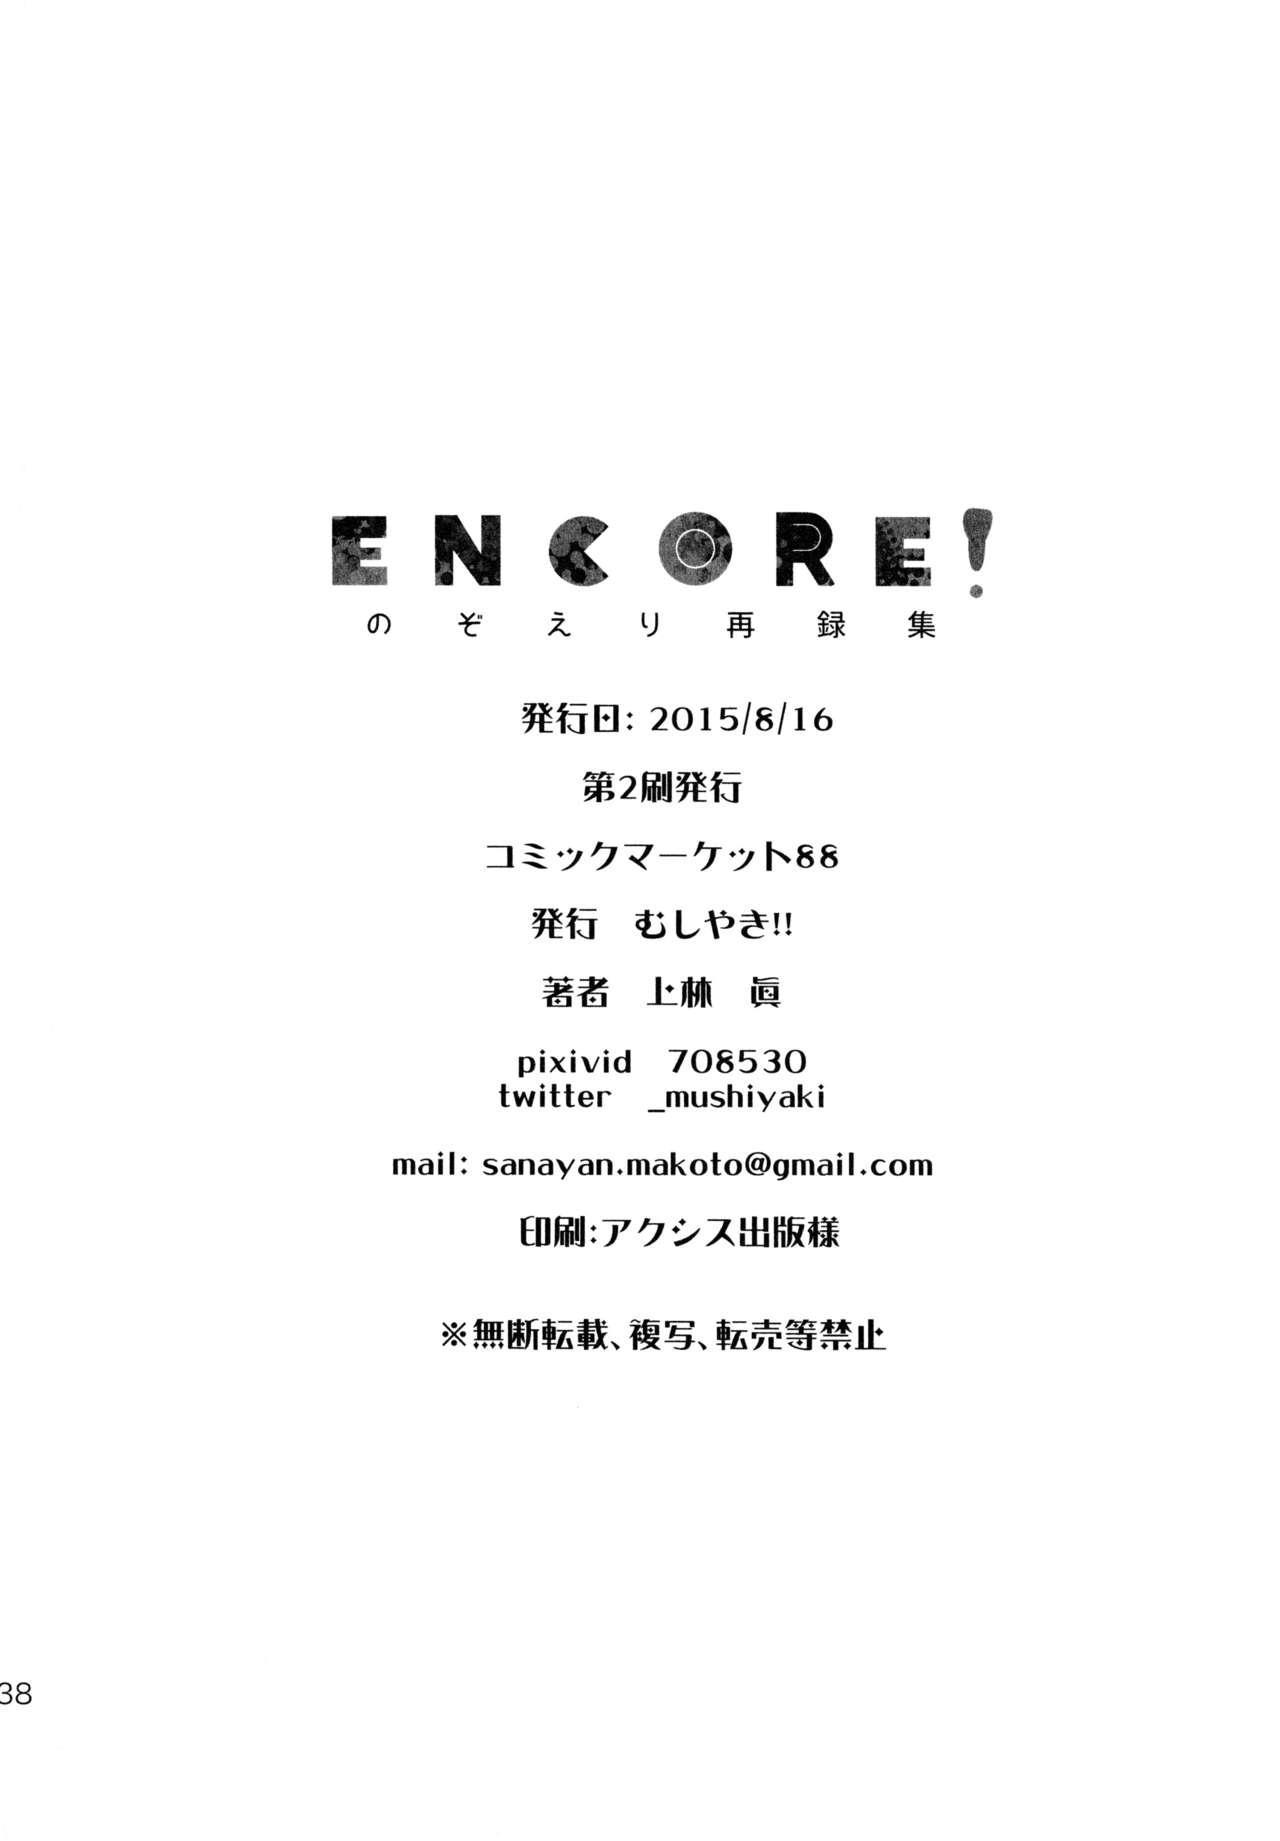 ENCORE! 336